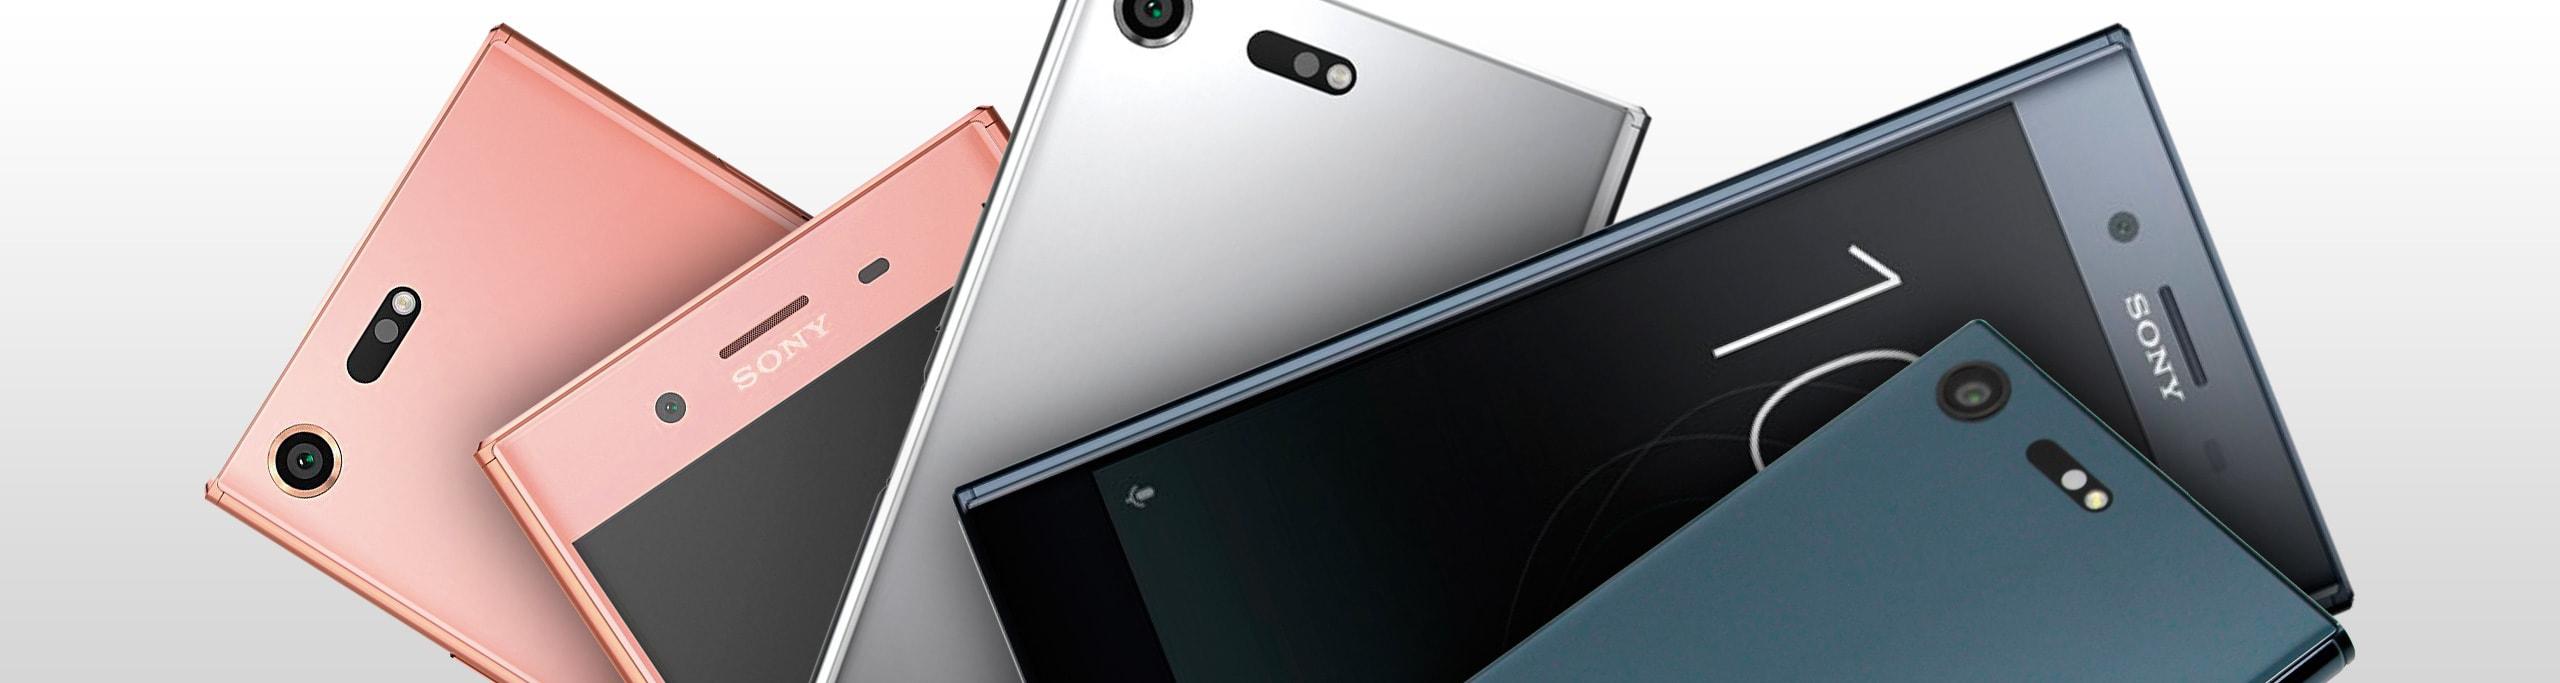 XZ Premium (G8141)